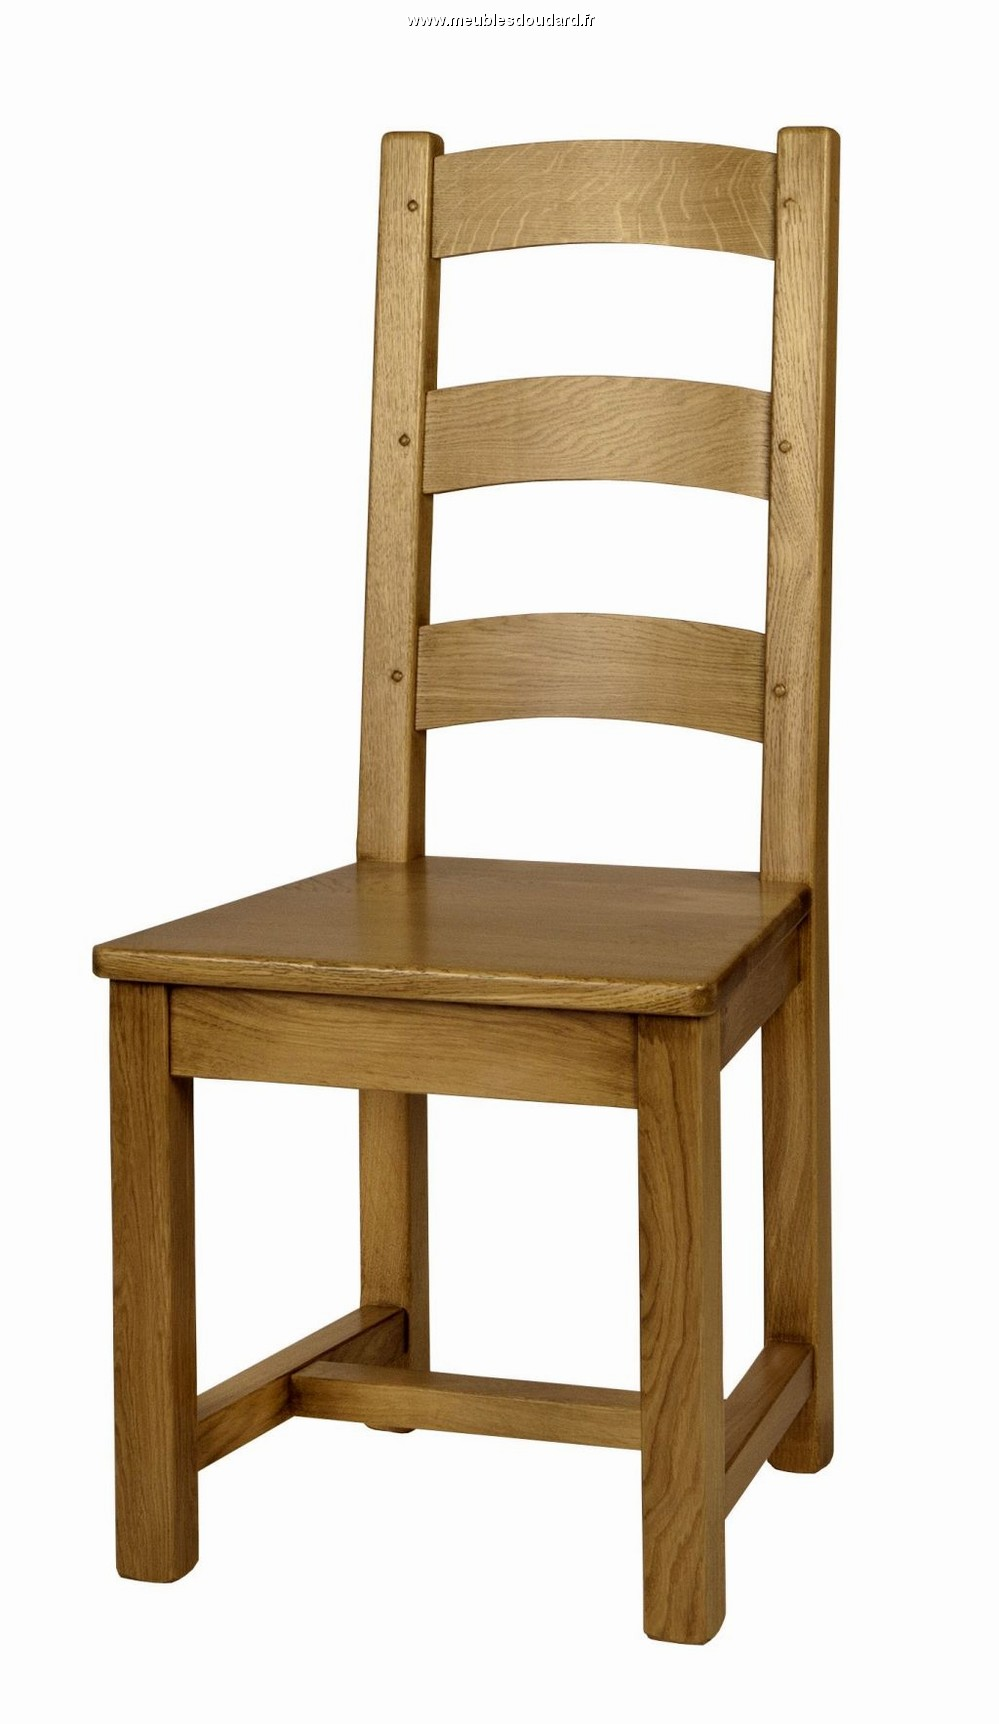 chaise chene massif assise en bois ref m622